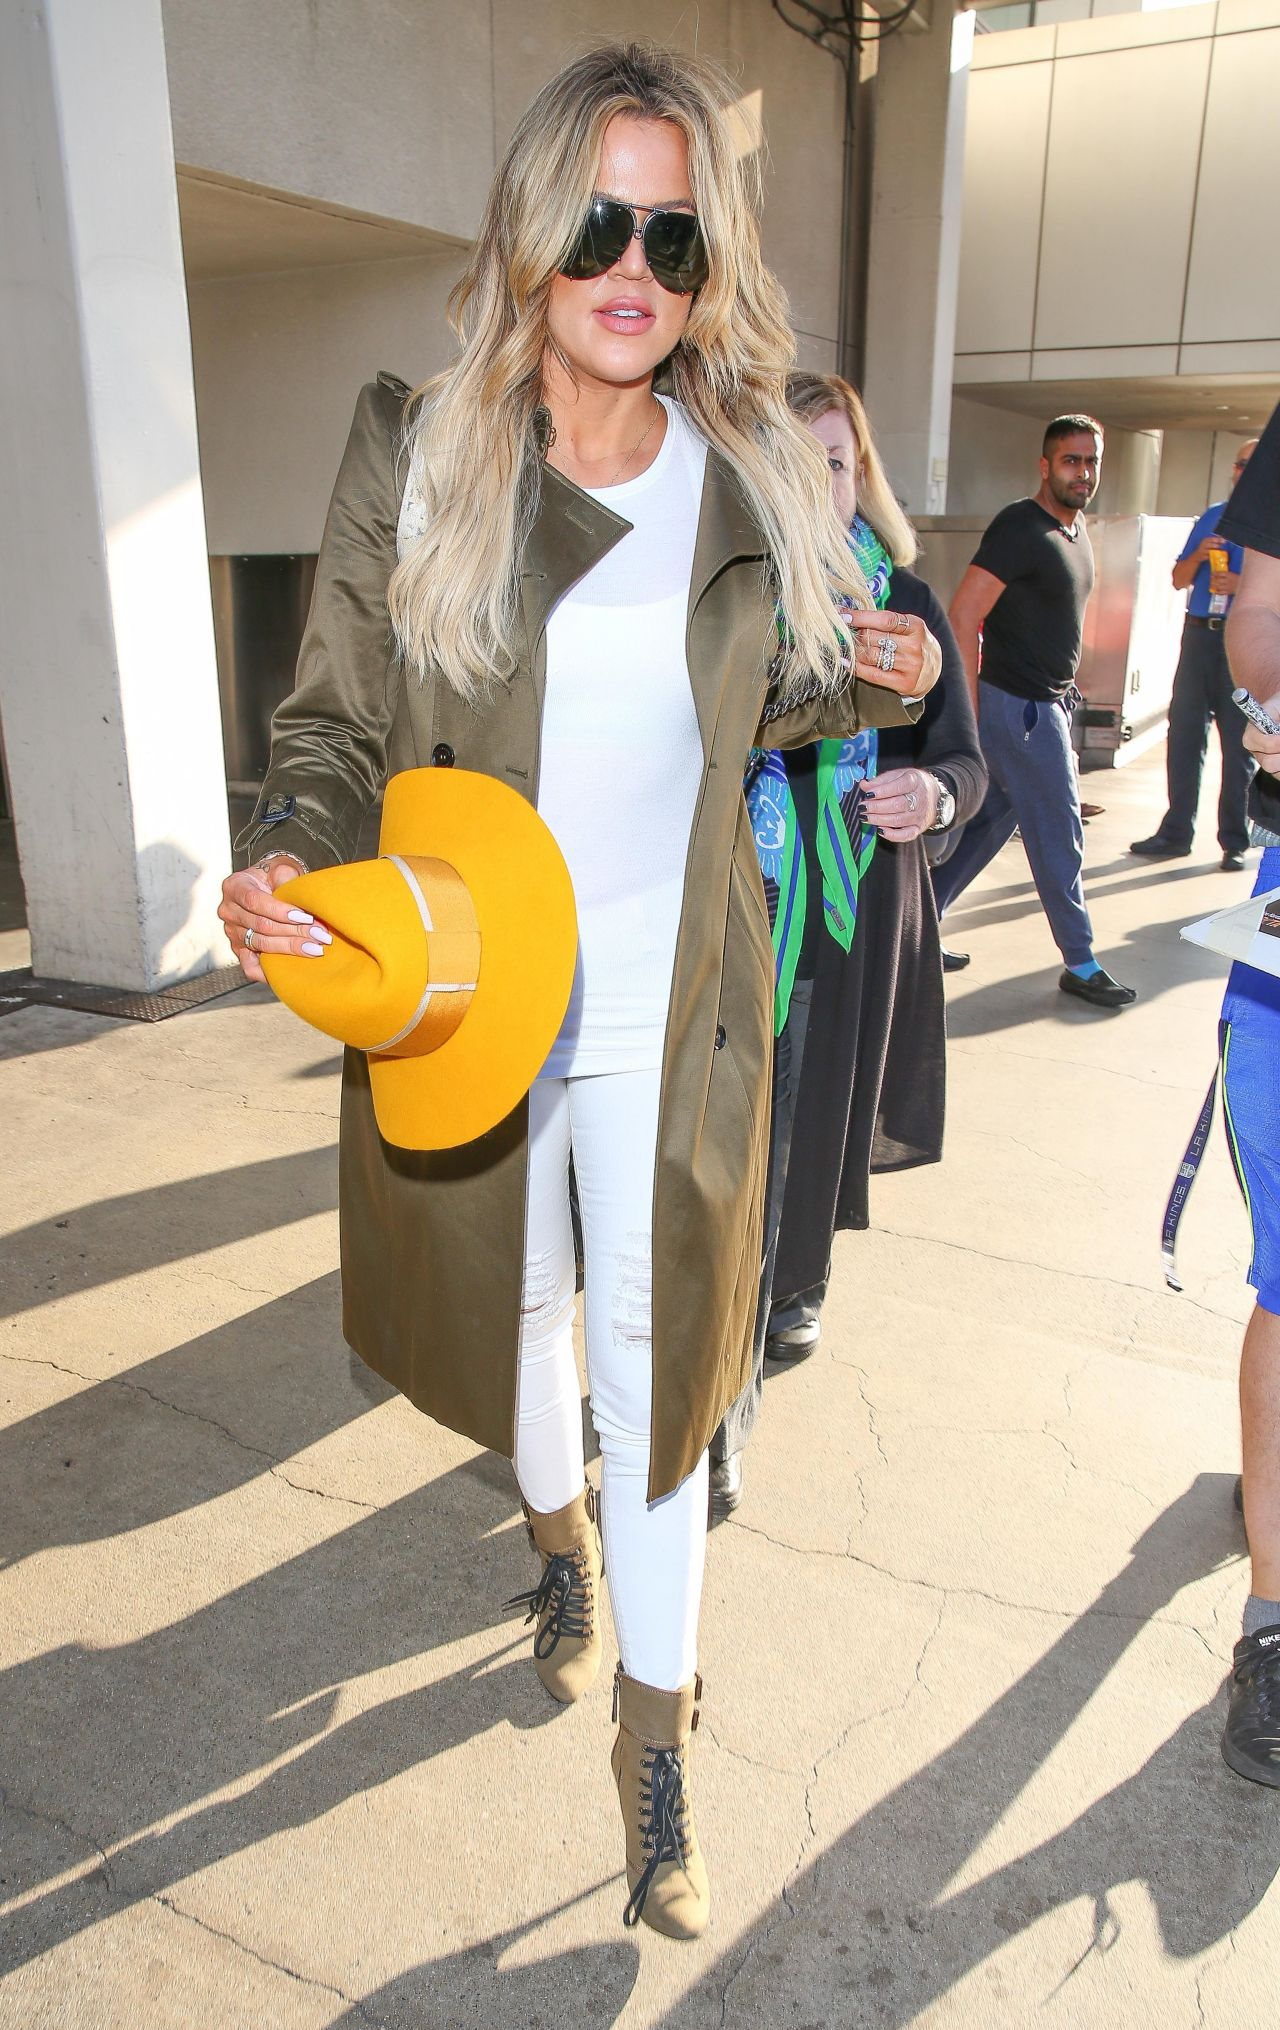 Khloe Kardashian - LAX Airport in Los Angeles, May 2015